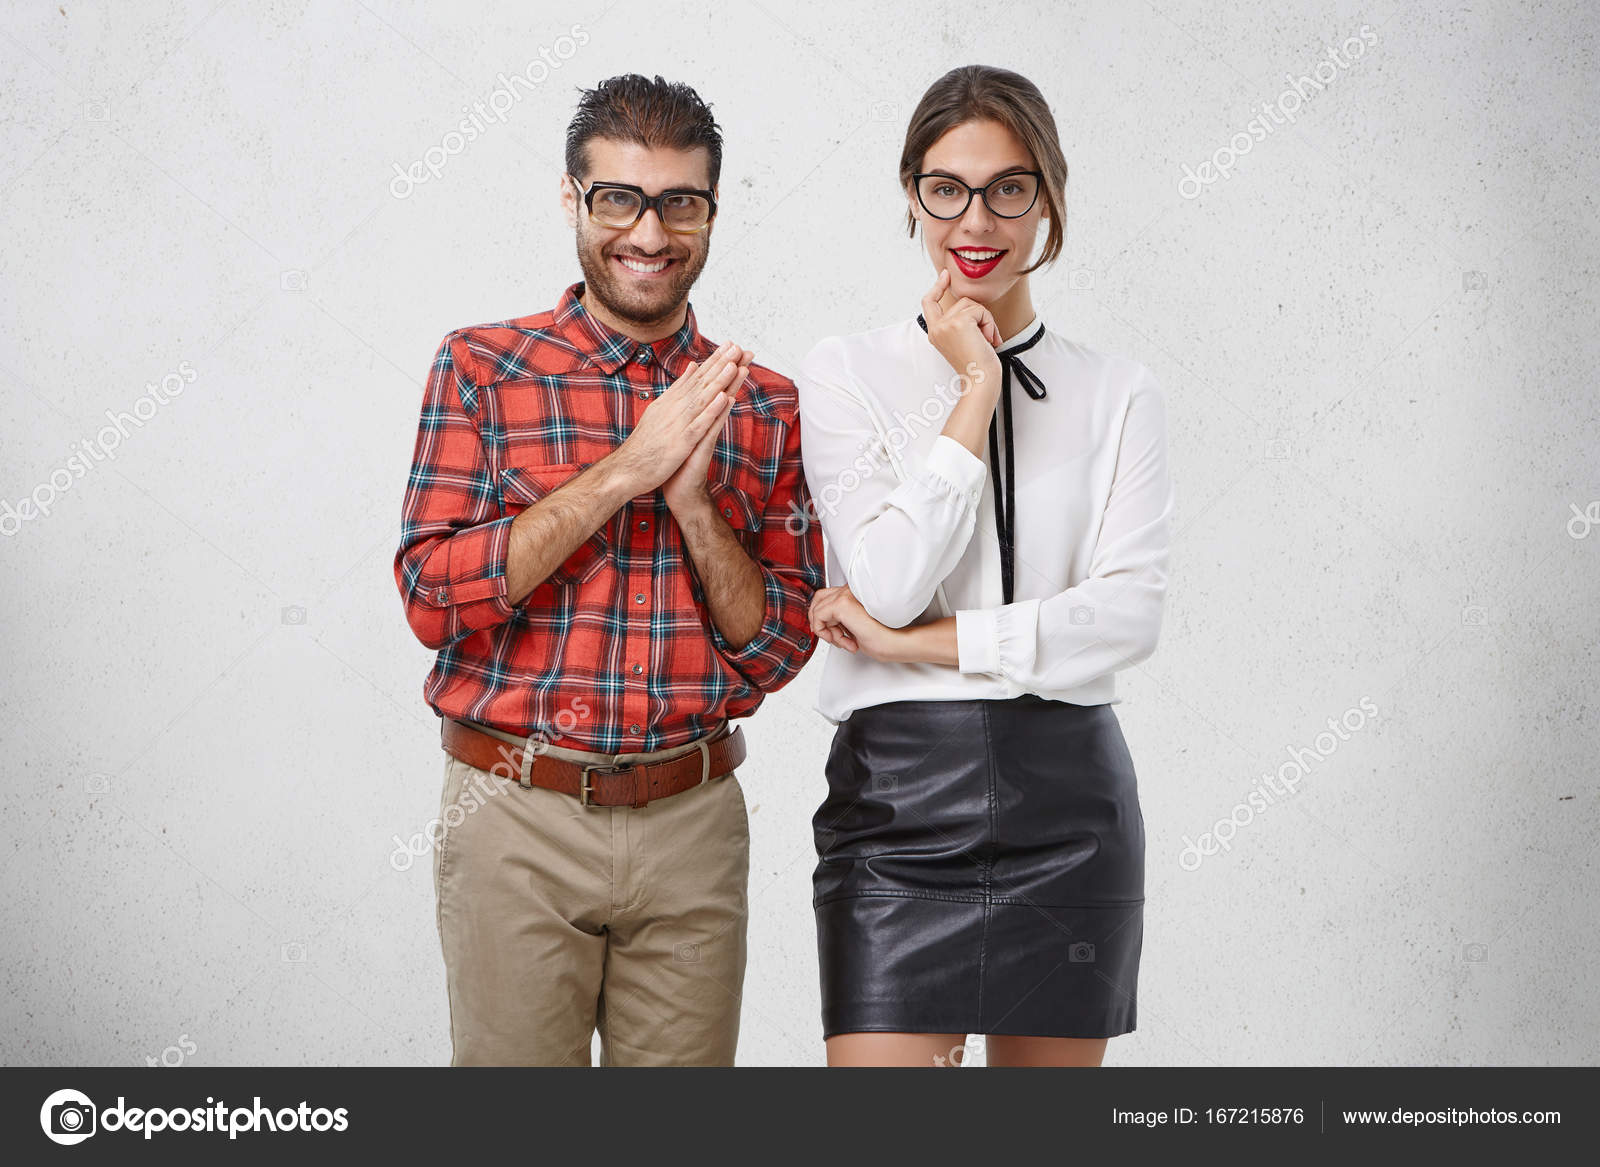 d2a5bdb3ec Οριζόντια πορτρέτο του αστεία γελοίο δυο γενειοφόρος αρσενικό geek σε παλιά  ξεπερασμένης γυαλιά και όμορφη πανέμορφη νεαρή γυναίκα που φοράει μοντέρνα  ρούχα ...